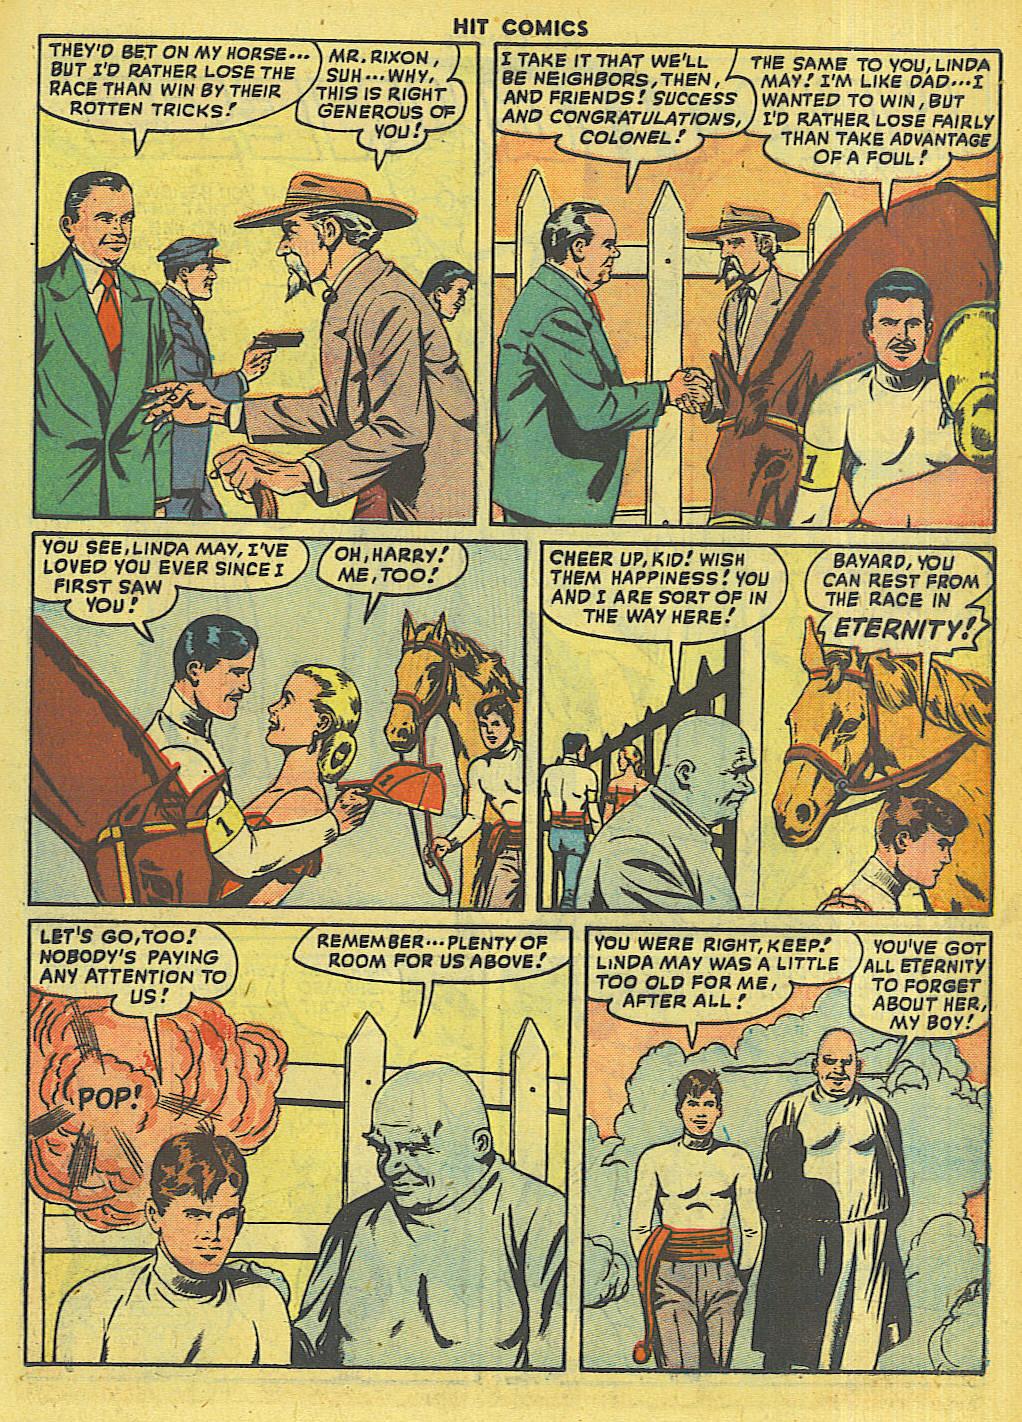 Read online Hit Comics comic -  Issue #56 - 15